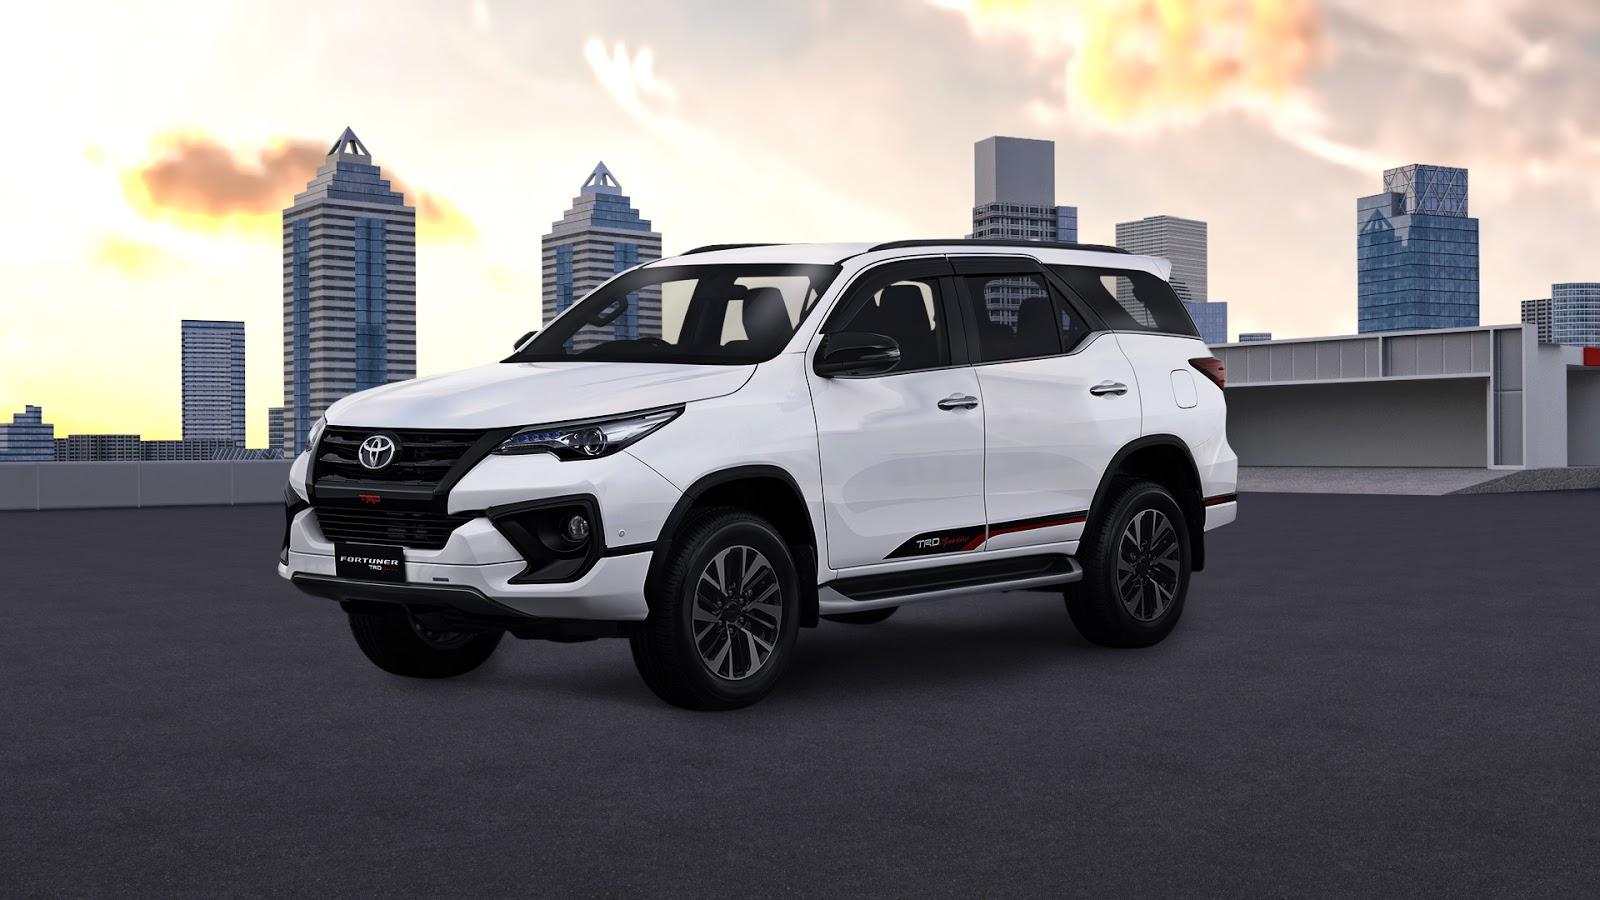 all new agya trd 2017 grand avanza type g car news update สอง toyota fortuner sportivo